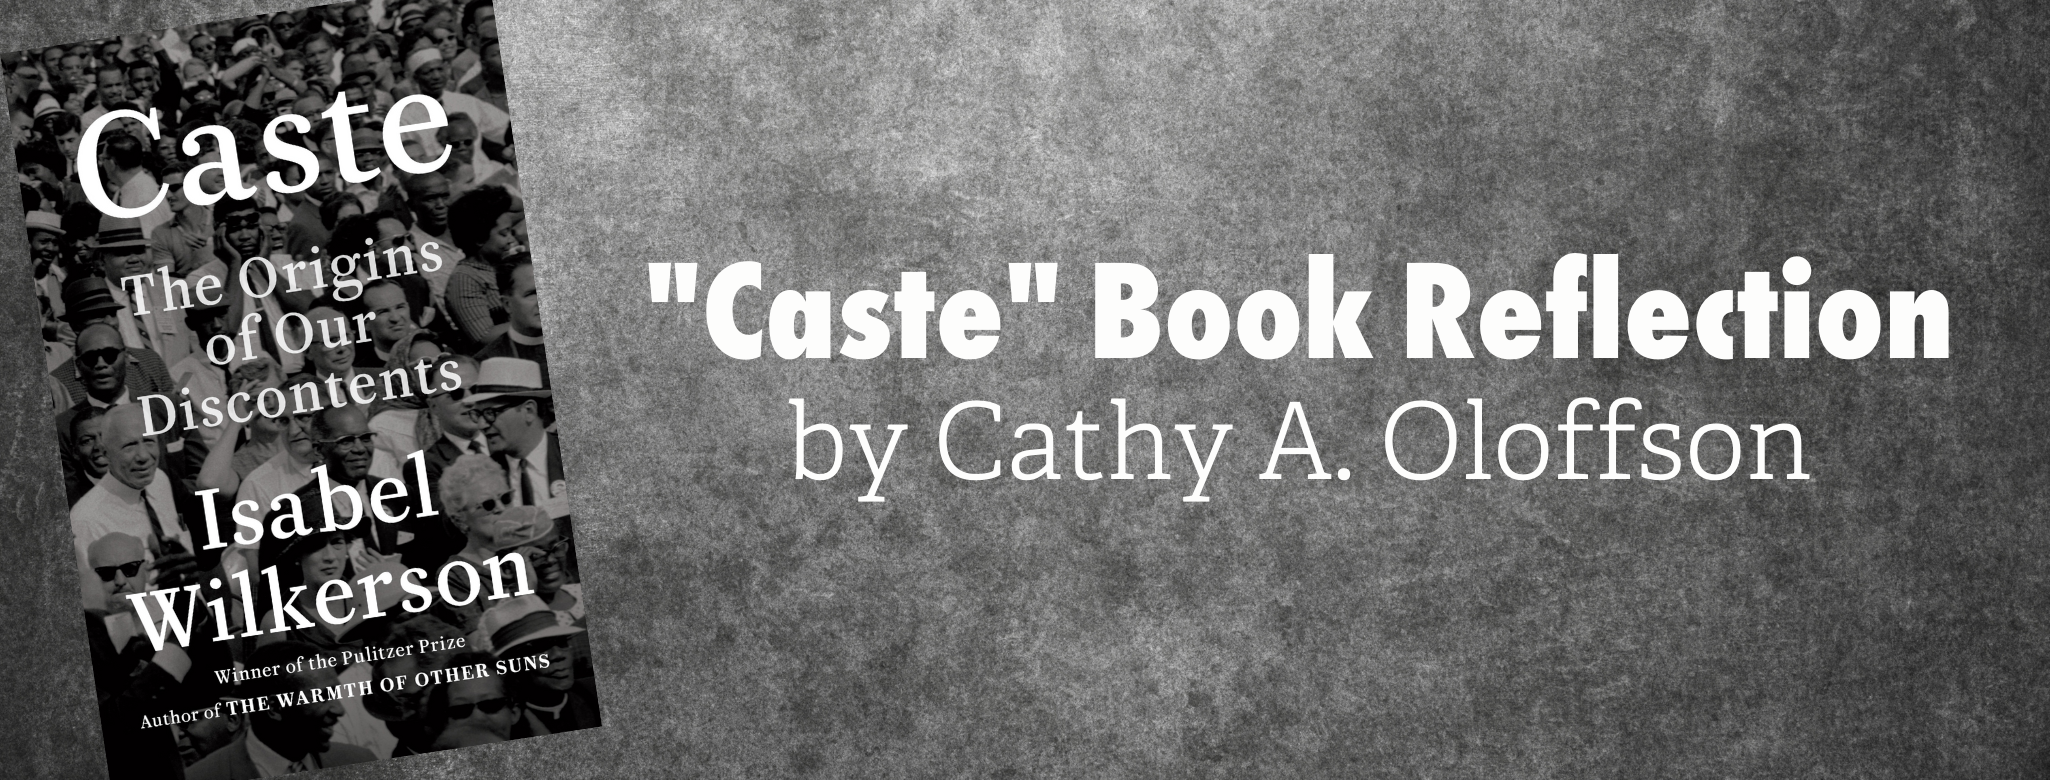 Caste Book Reflection